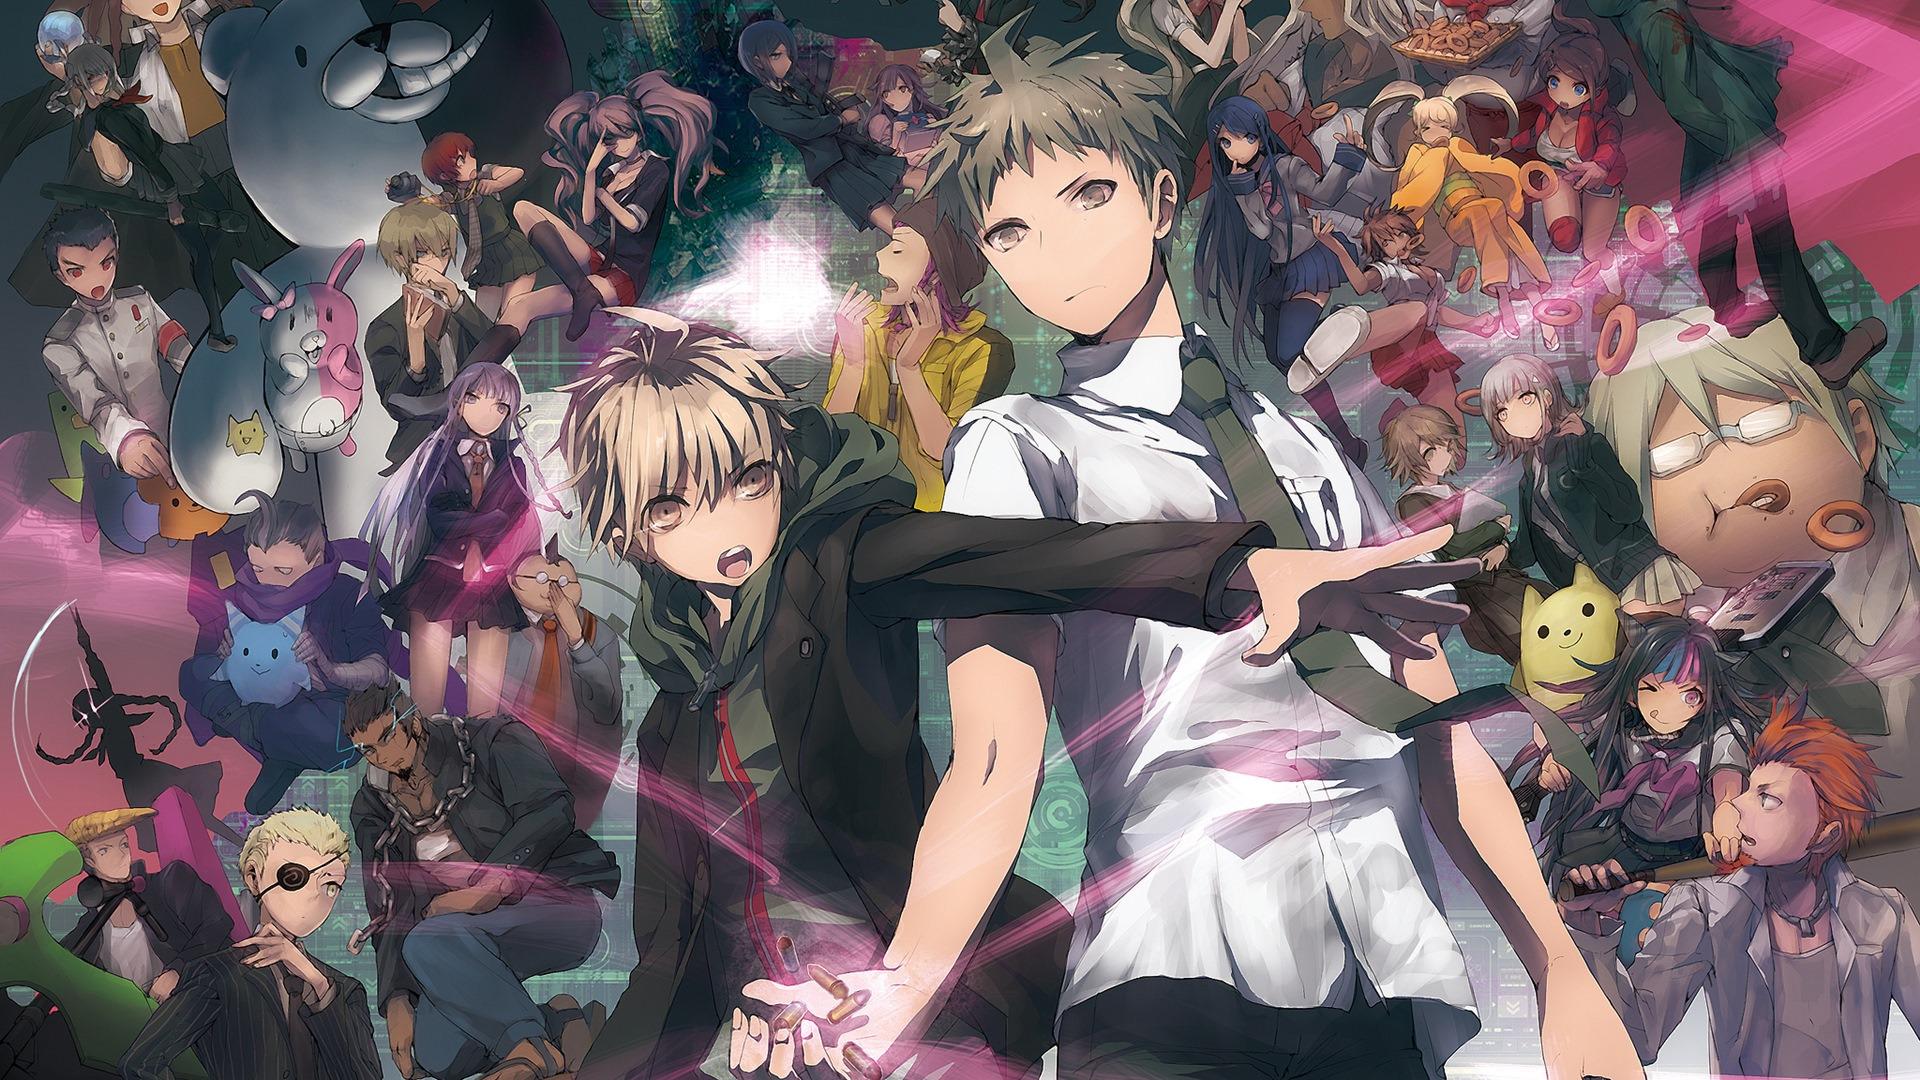 Anime Danganronpa 3: The End of Kibougamine Gakuen - Zetsubou Hen